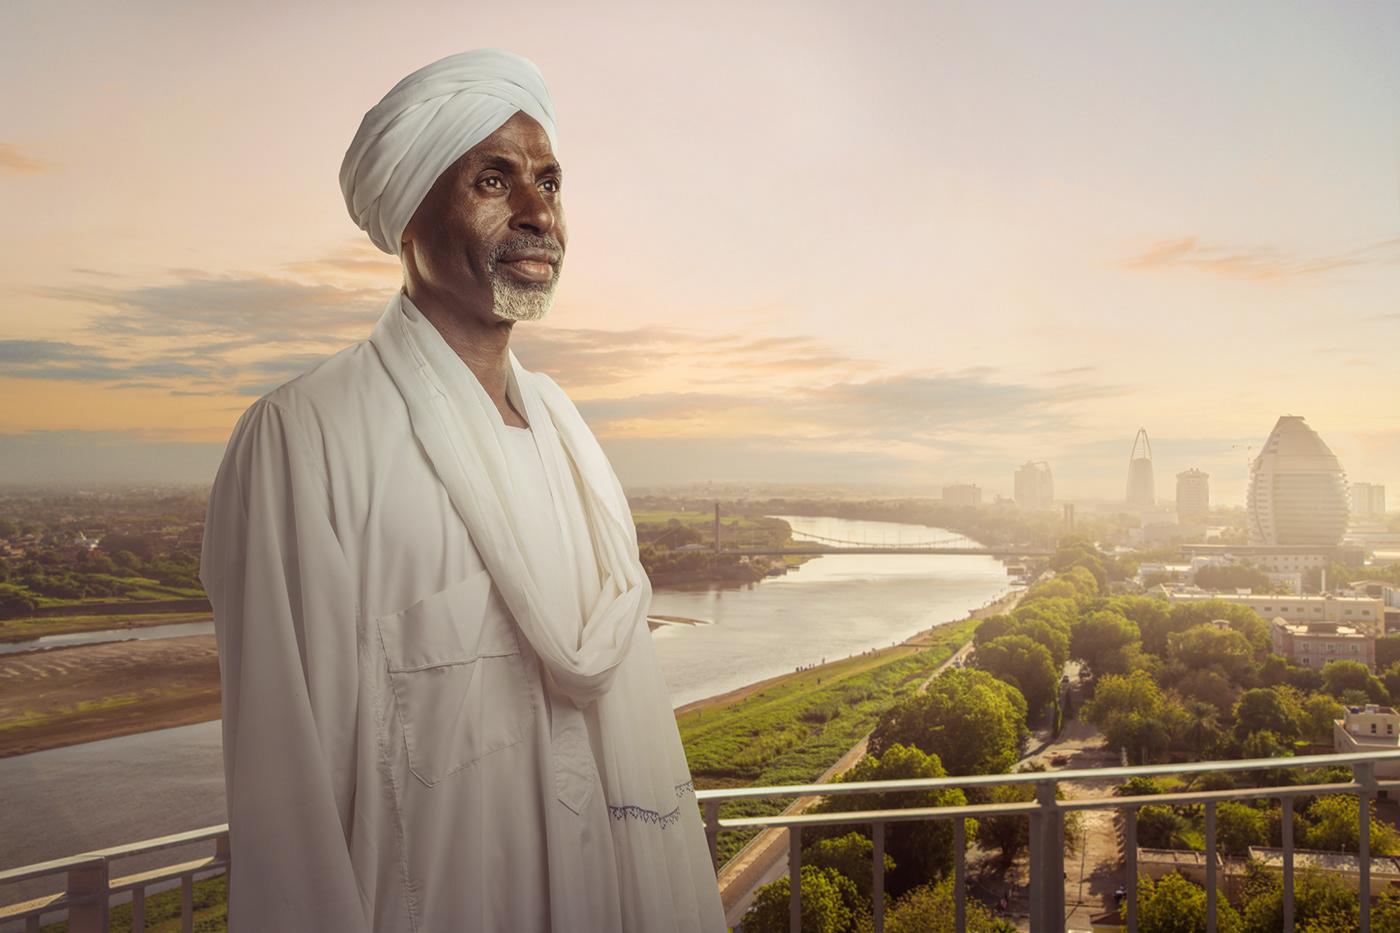 Zain Sudan-Ramadan 2019 Advertising Photography on Behance